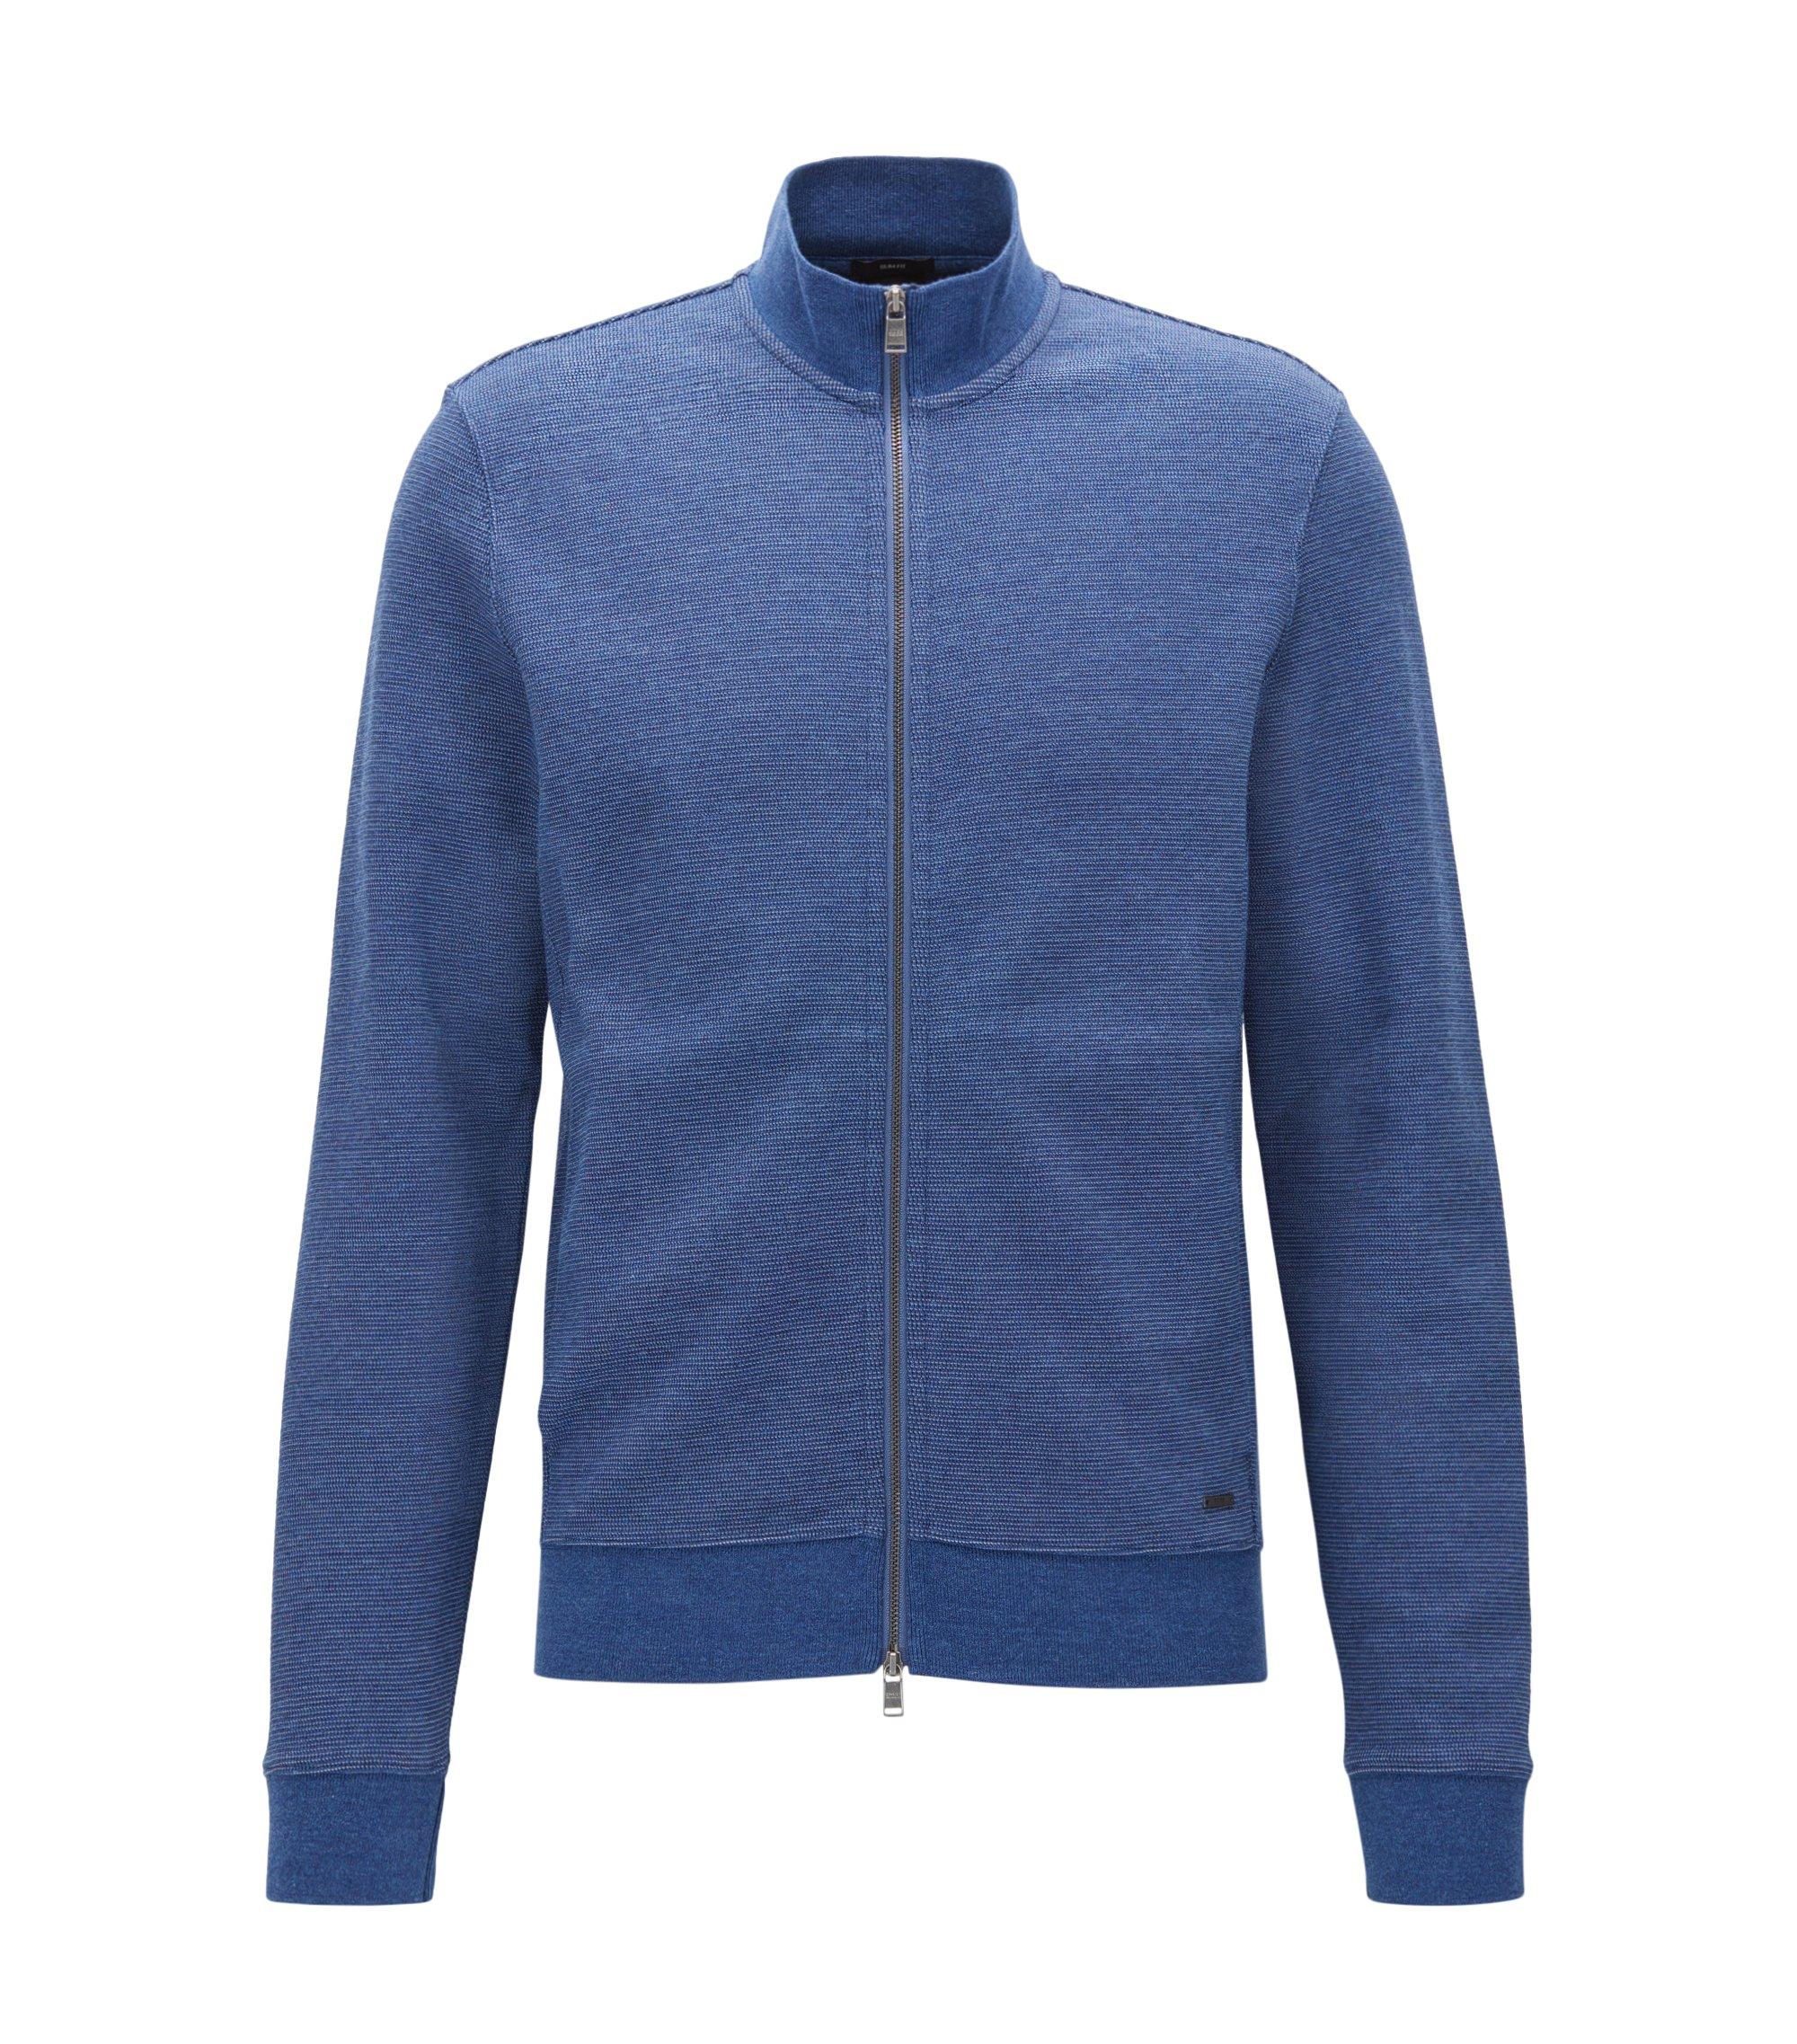 Slim-Fit Jacke aus zweifarbigem Baumwoll-Mix, Blau